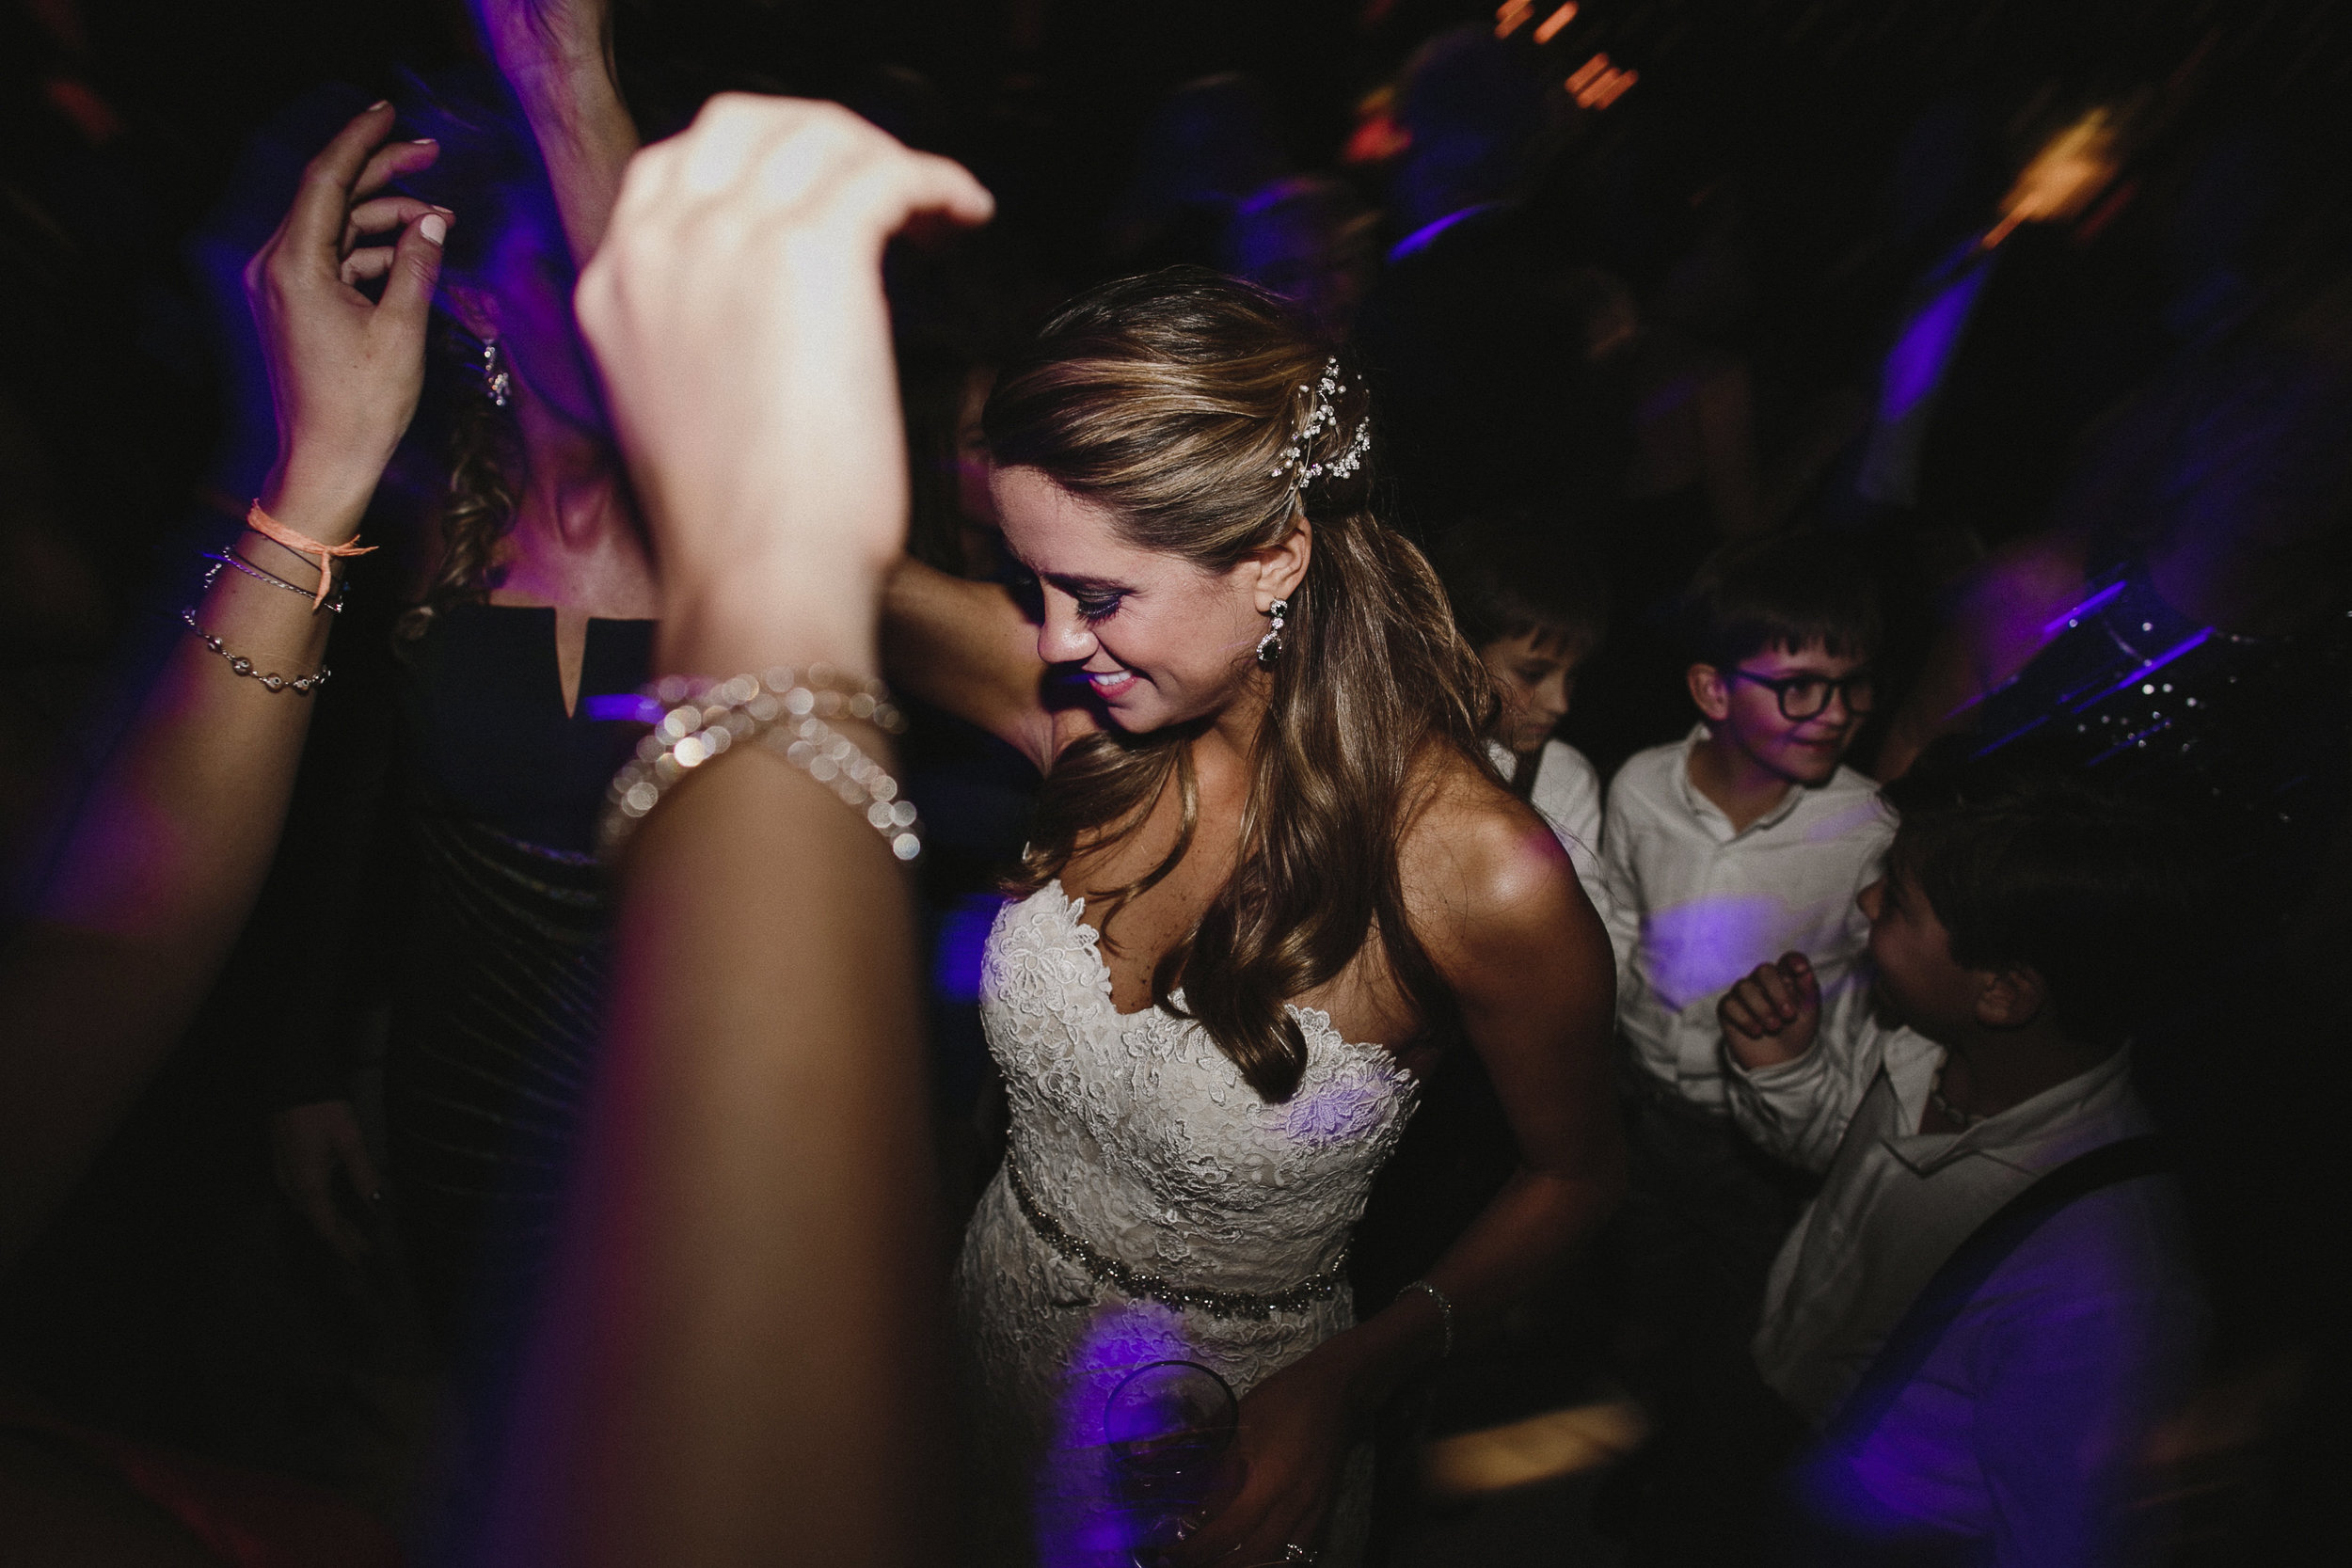 alfonso_flores_destination_wedding_photogrpahy_paola_alonso-1112.JPG